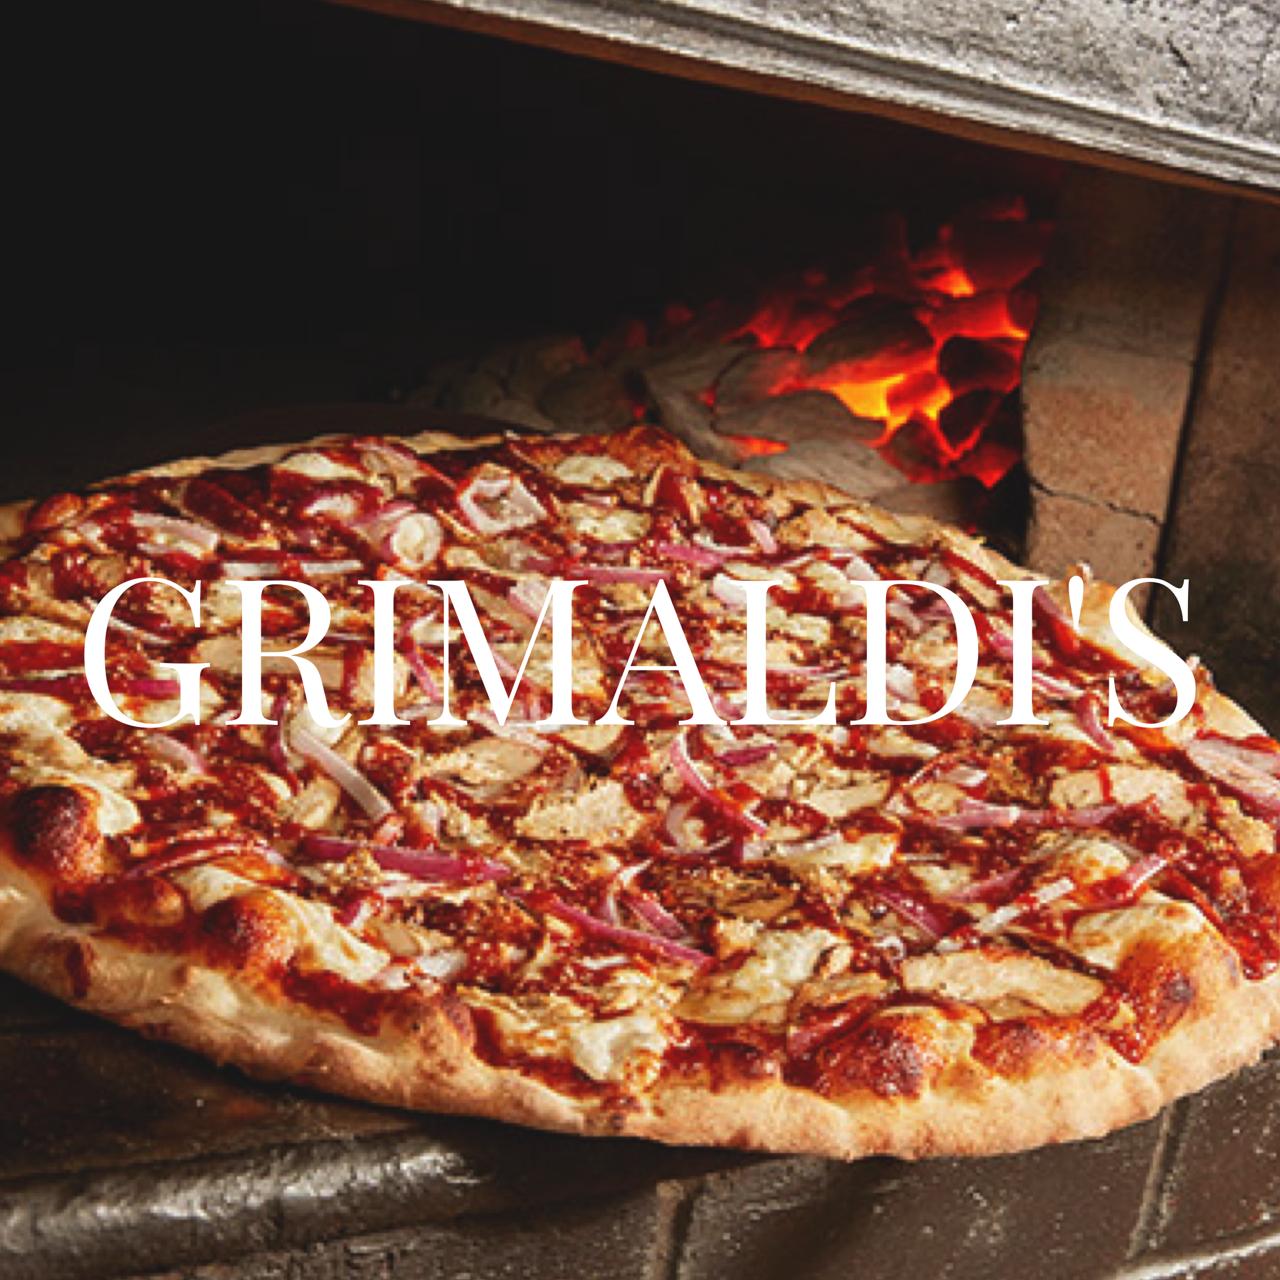 grimaldi's.png